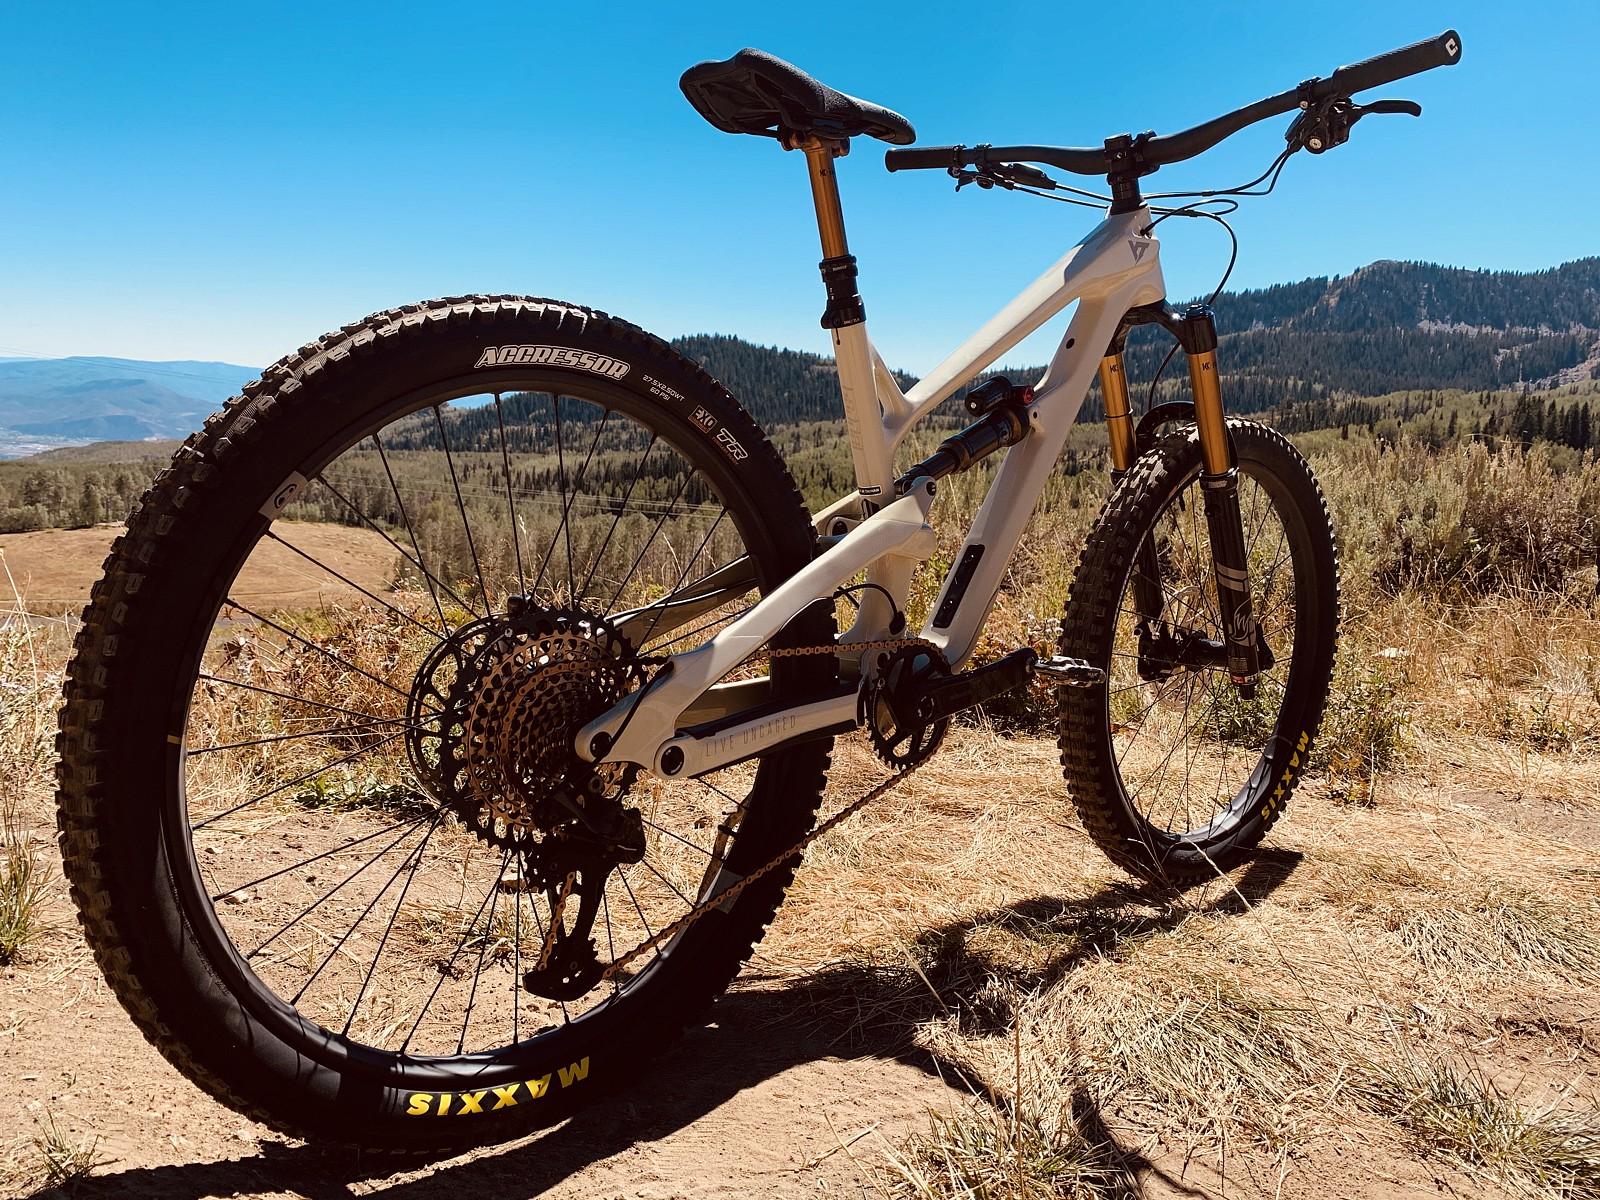 IMG E0194 - jaykalafatis - Mountain Biking Pictures - Vital MTB